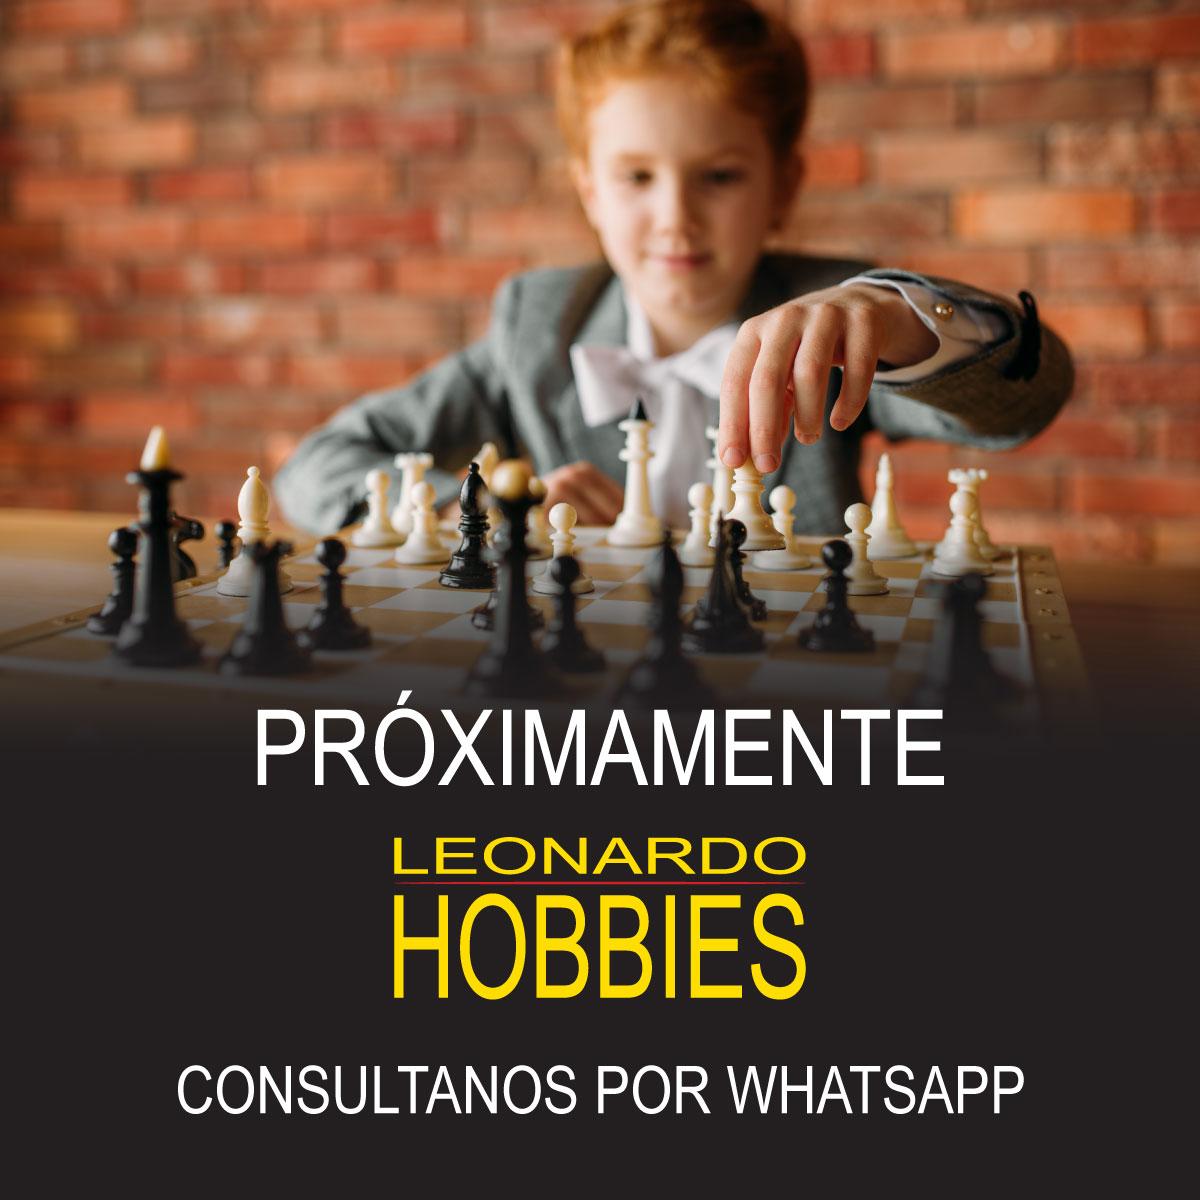 Proximamente - Consultanos por Whatsapp